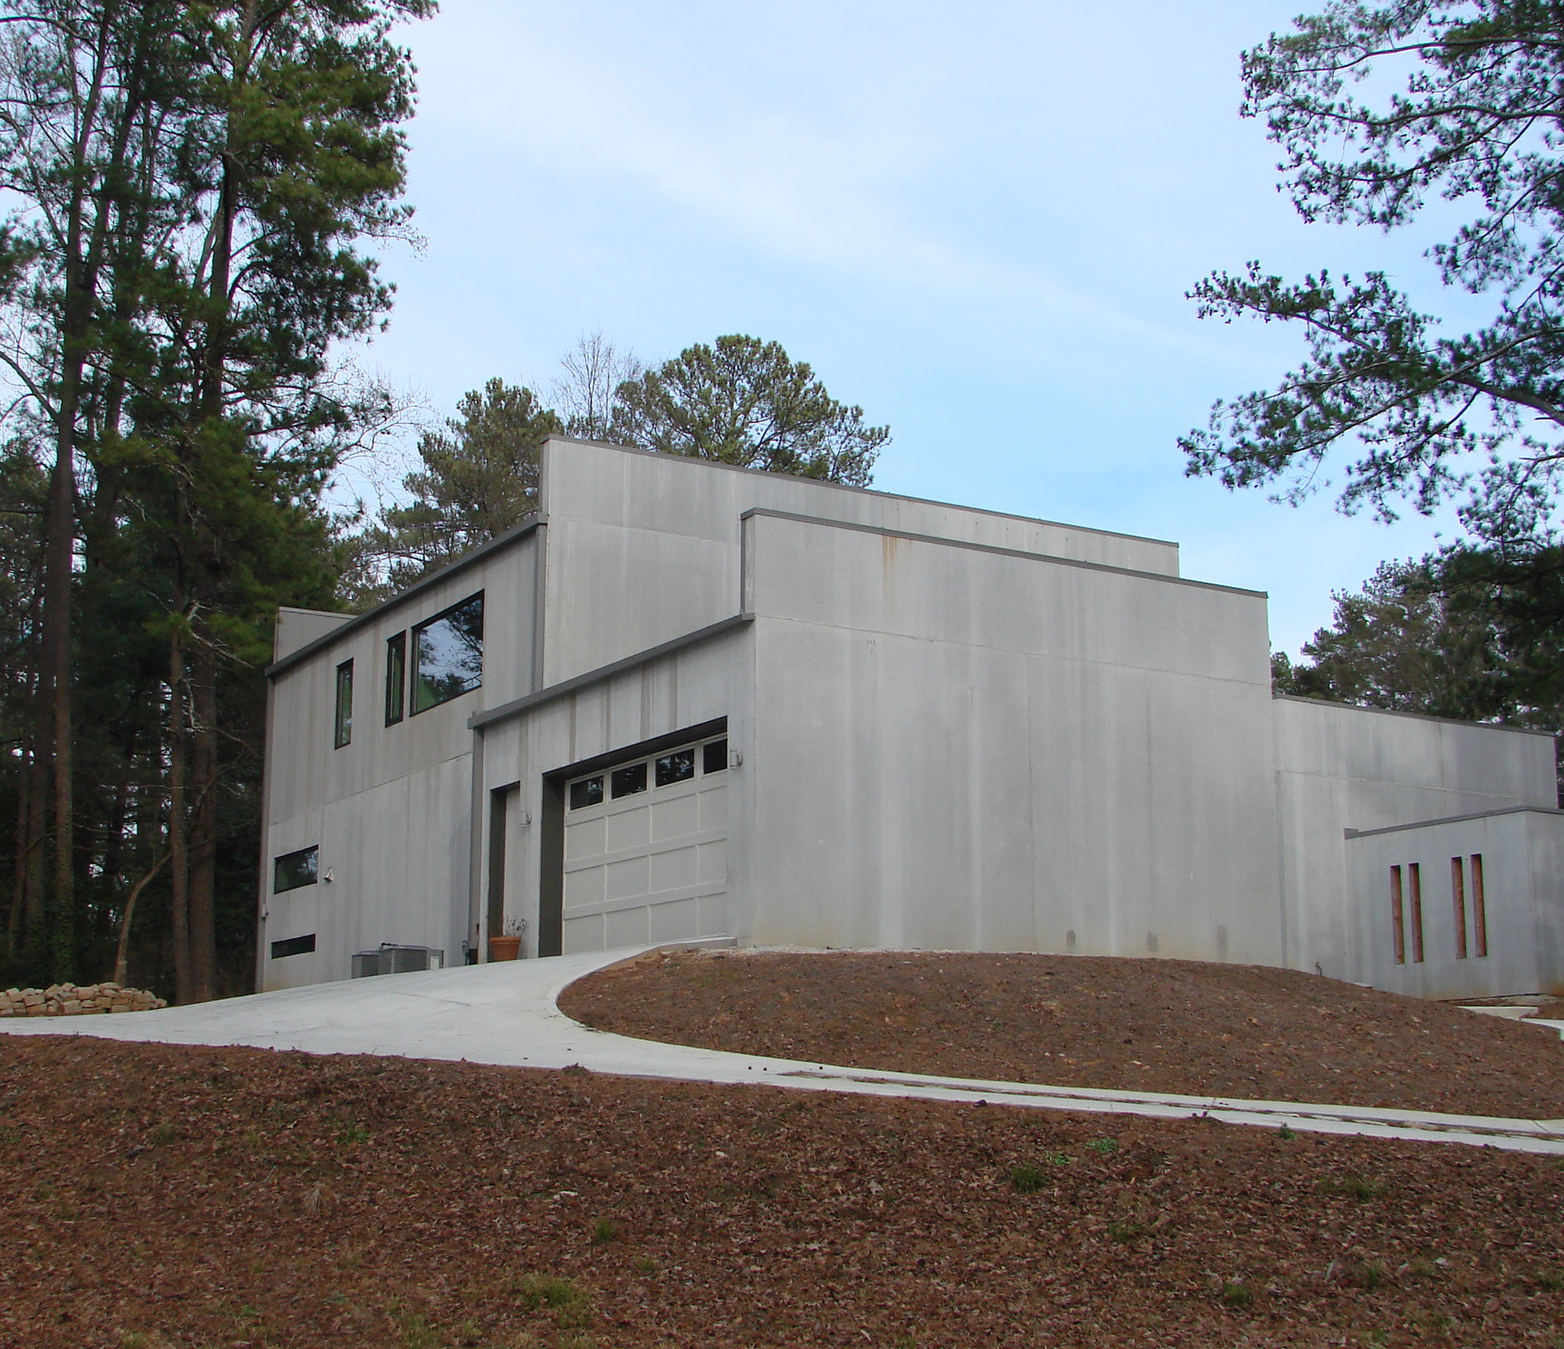 3 bedrm 2459 sq ft concrete block icf design house plan for Garage block